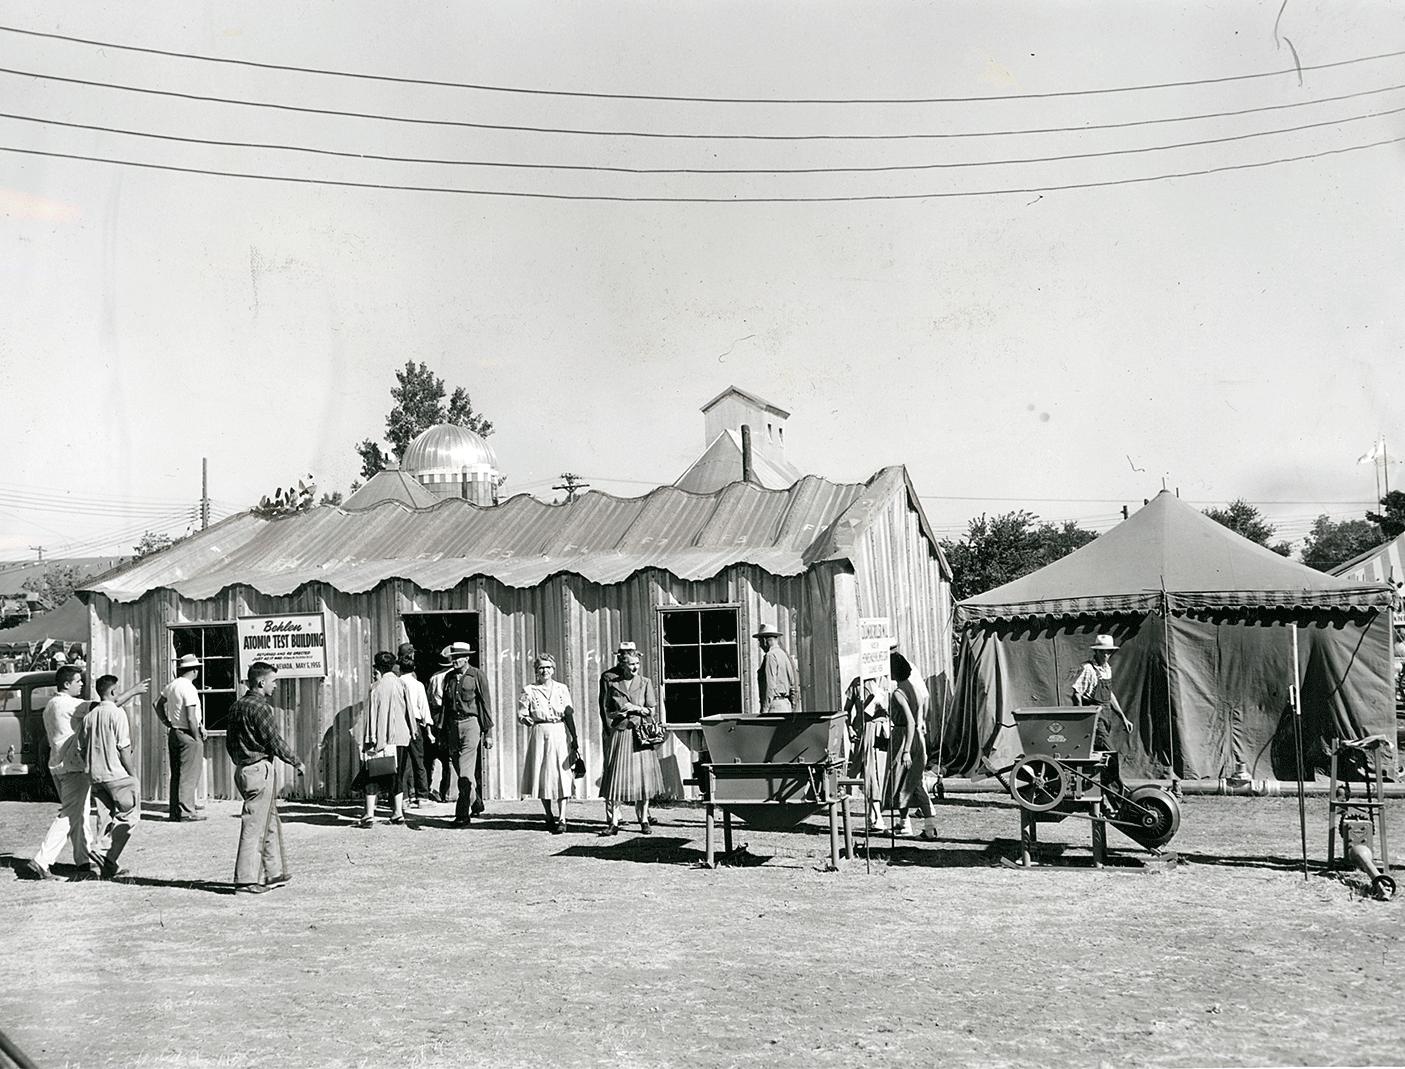 Image:  Behlen Manufacturing Atomic Test Building, on display at the Nebraska State Fair in 1955,   Nebraska State Historical Society